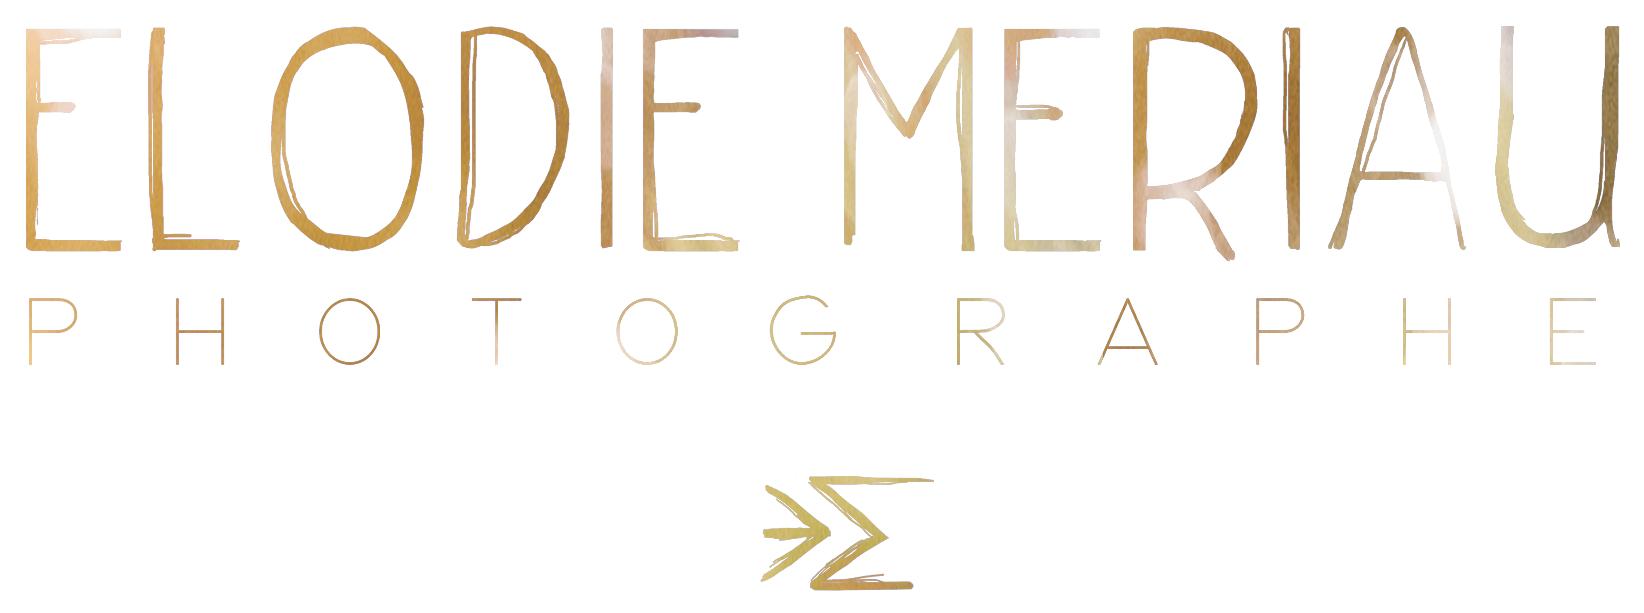 Elodie Meriau - Photographe - Montreal